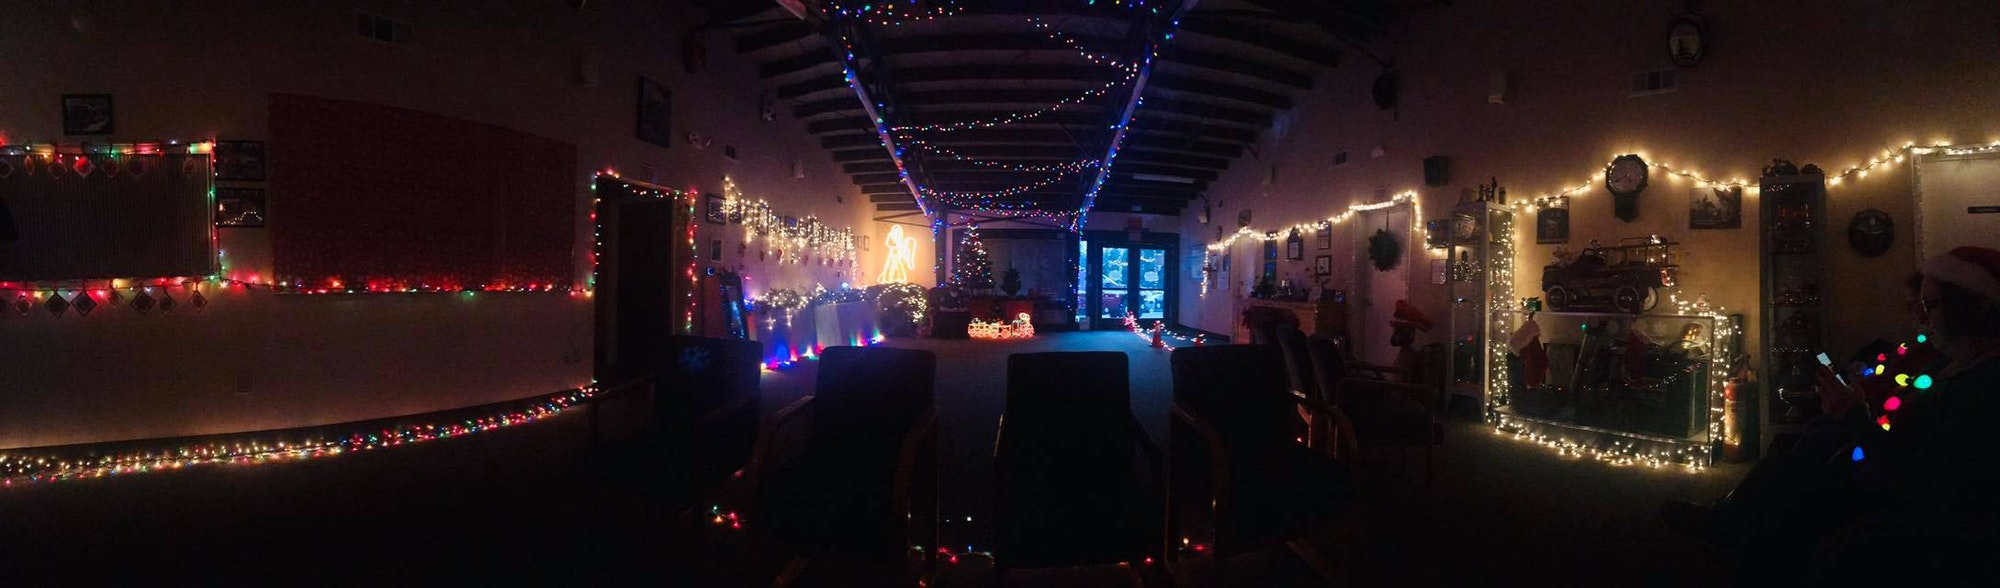 May contain: club, lighting, night club, and night life